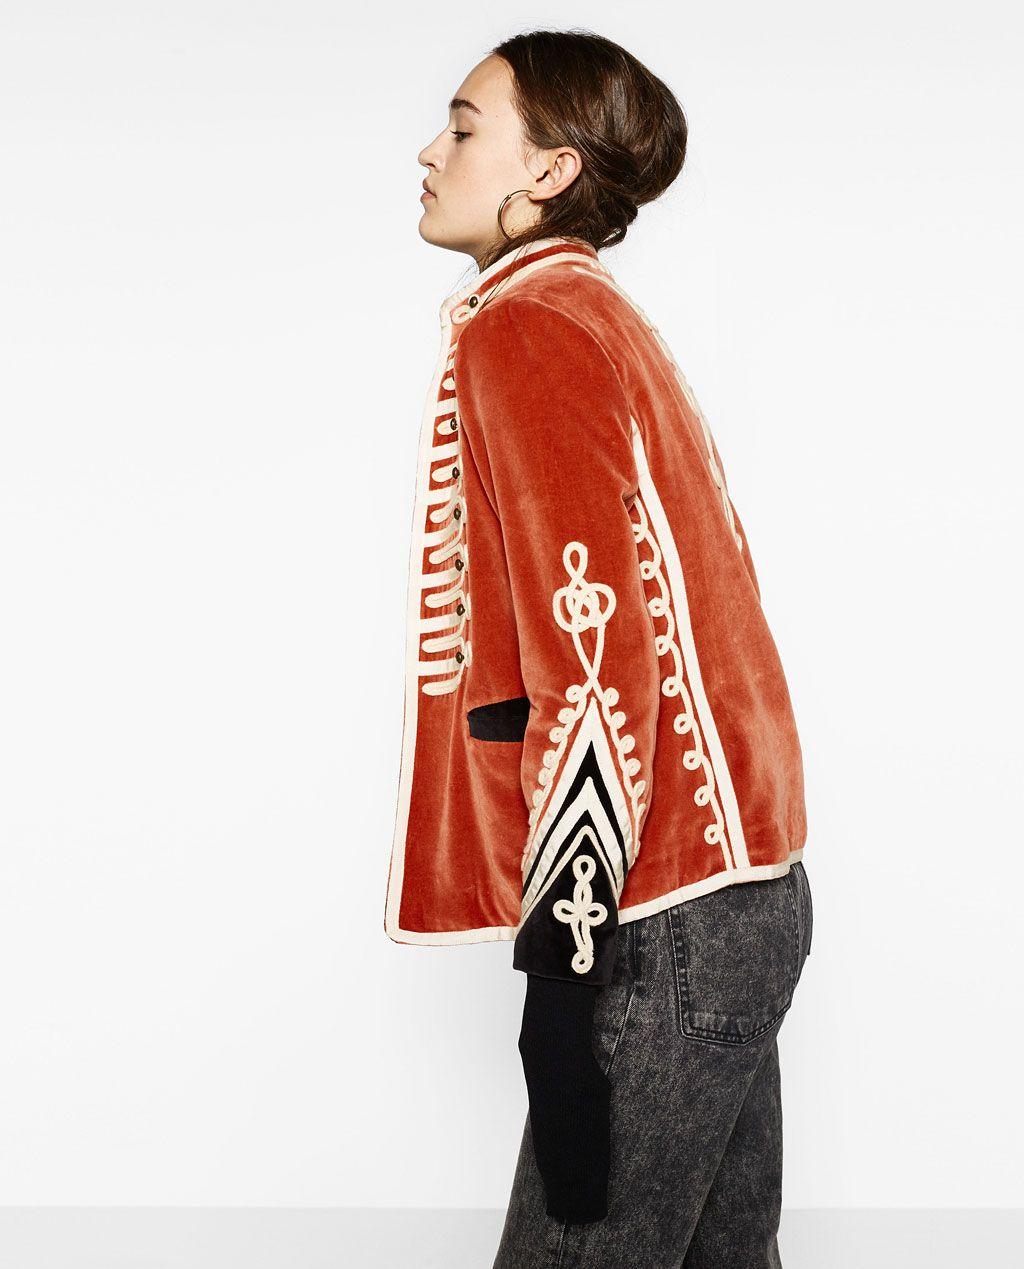 Velvet Military Jacket Jackets Outerwear Woman Zara United States Military Fashion Jackets Military Jacket [ 1269 x 1024 Pixel ]